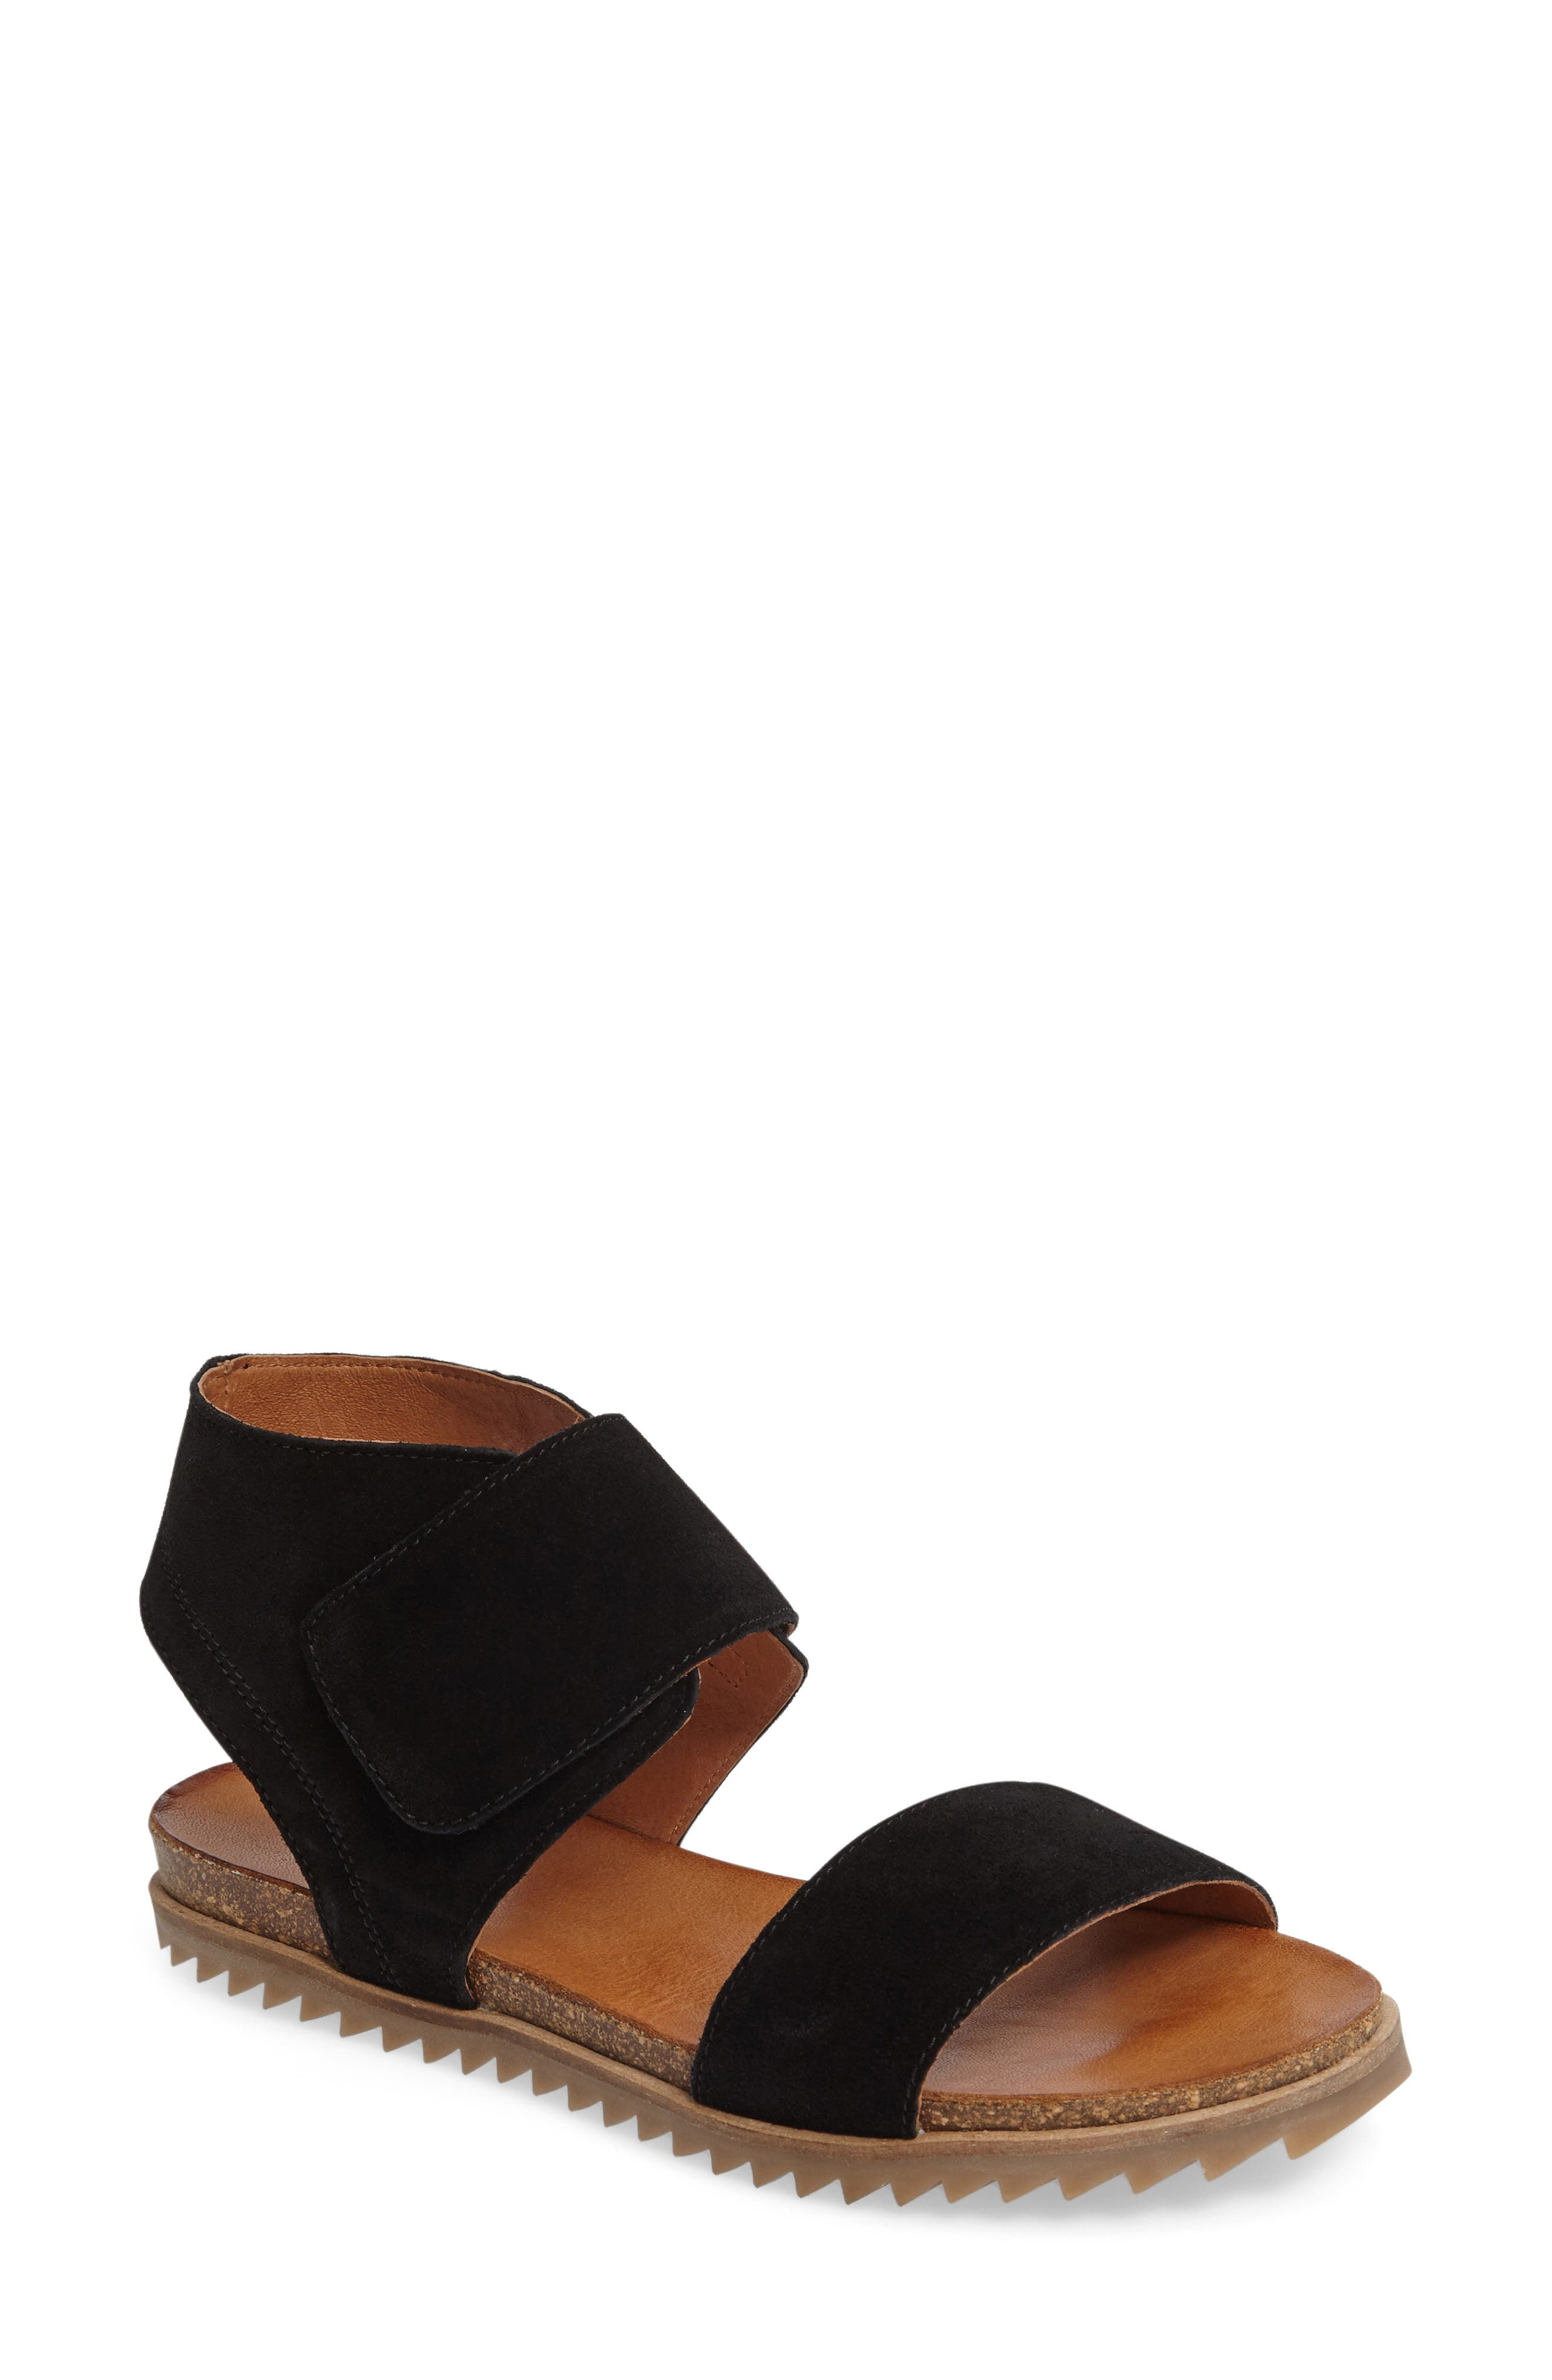 Miz Mooz Rori Sandal (Women)